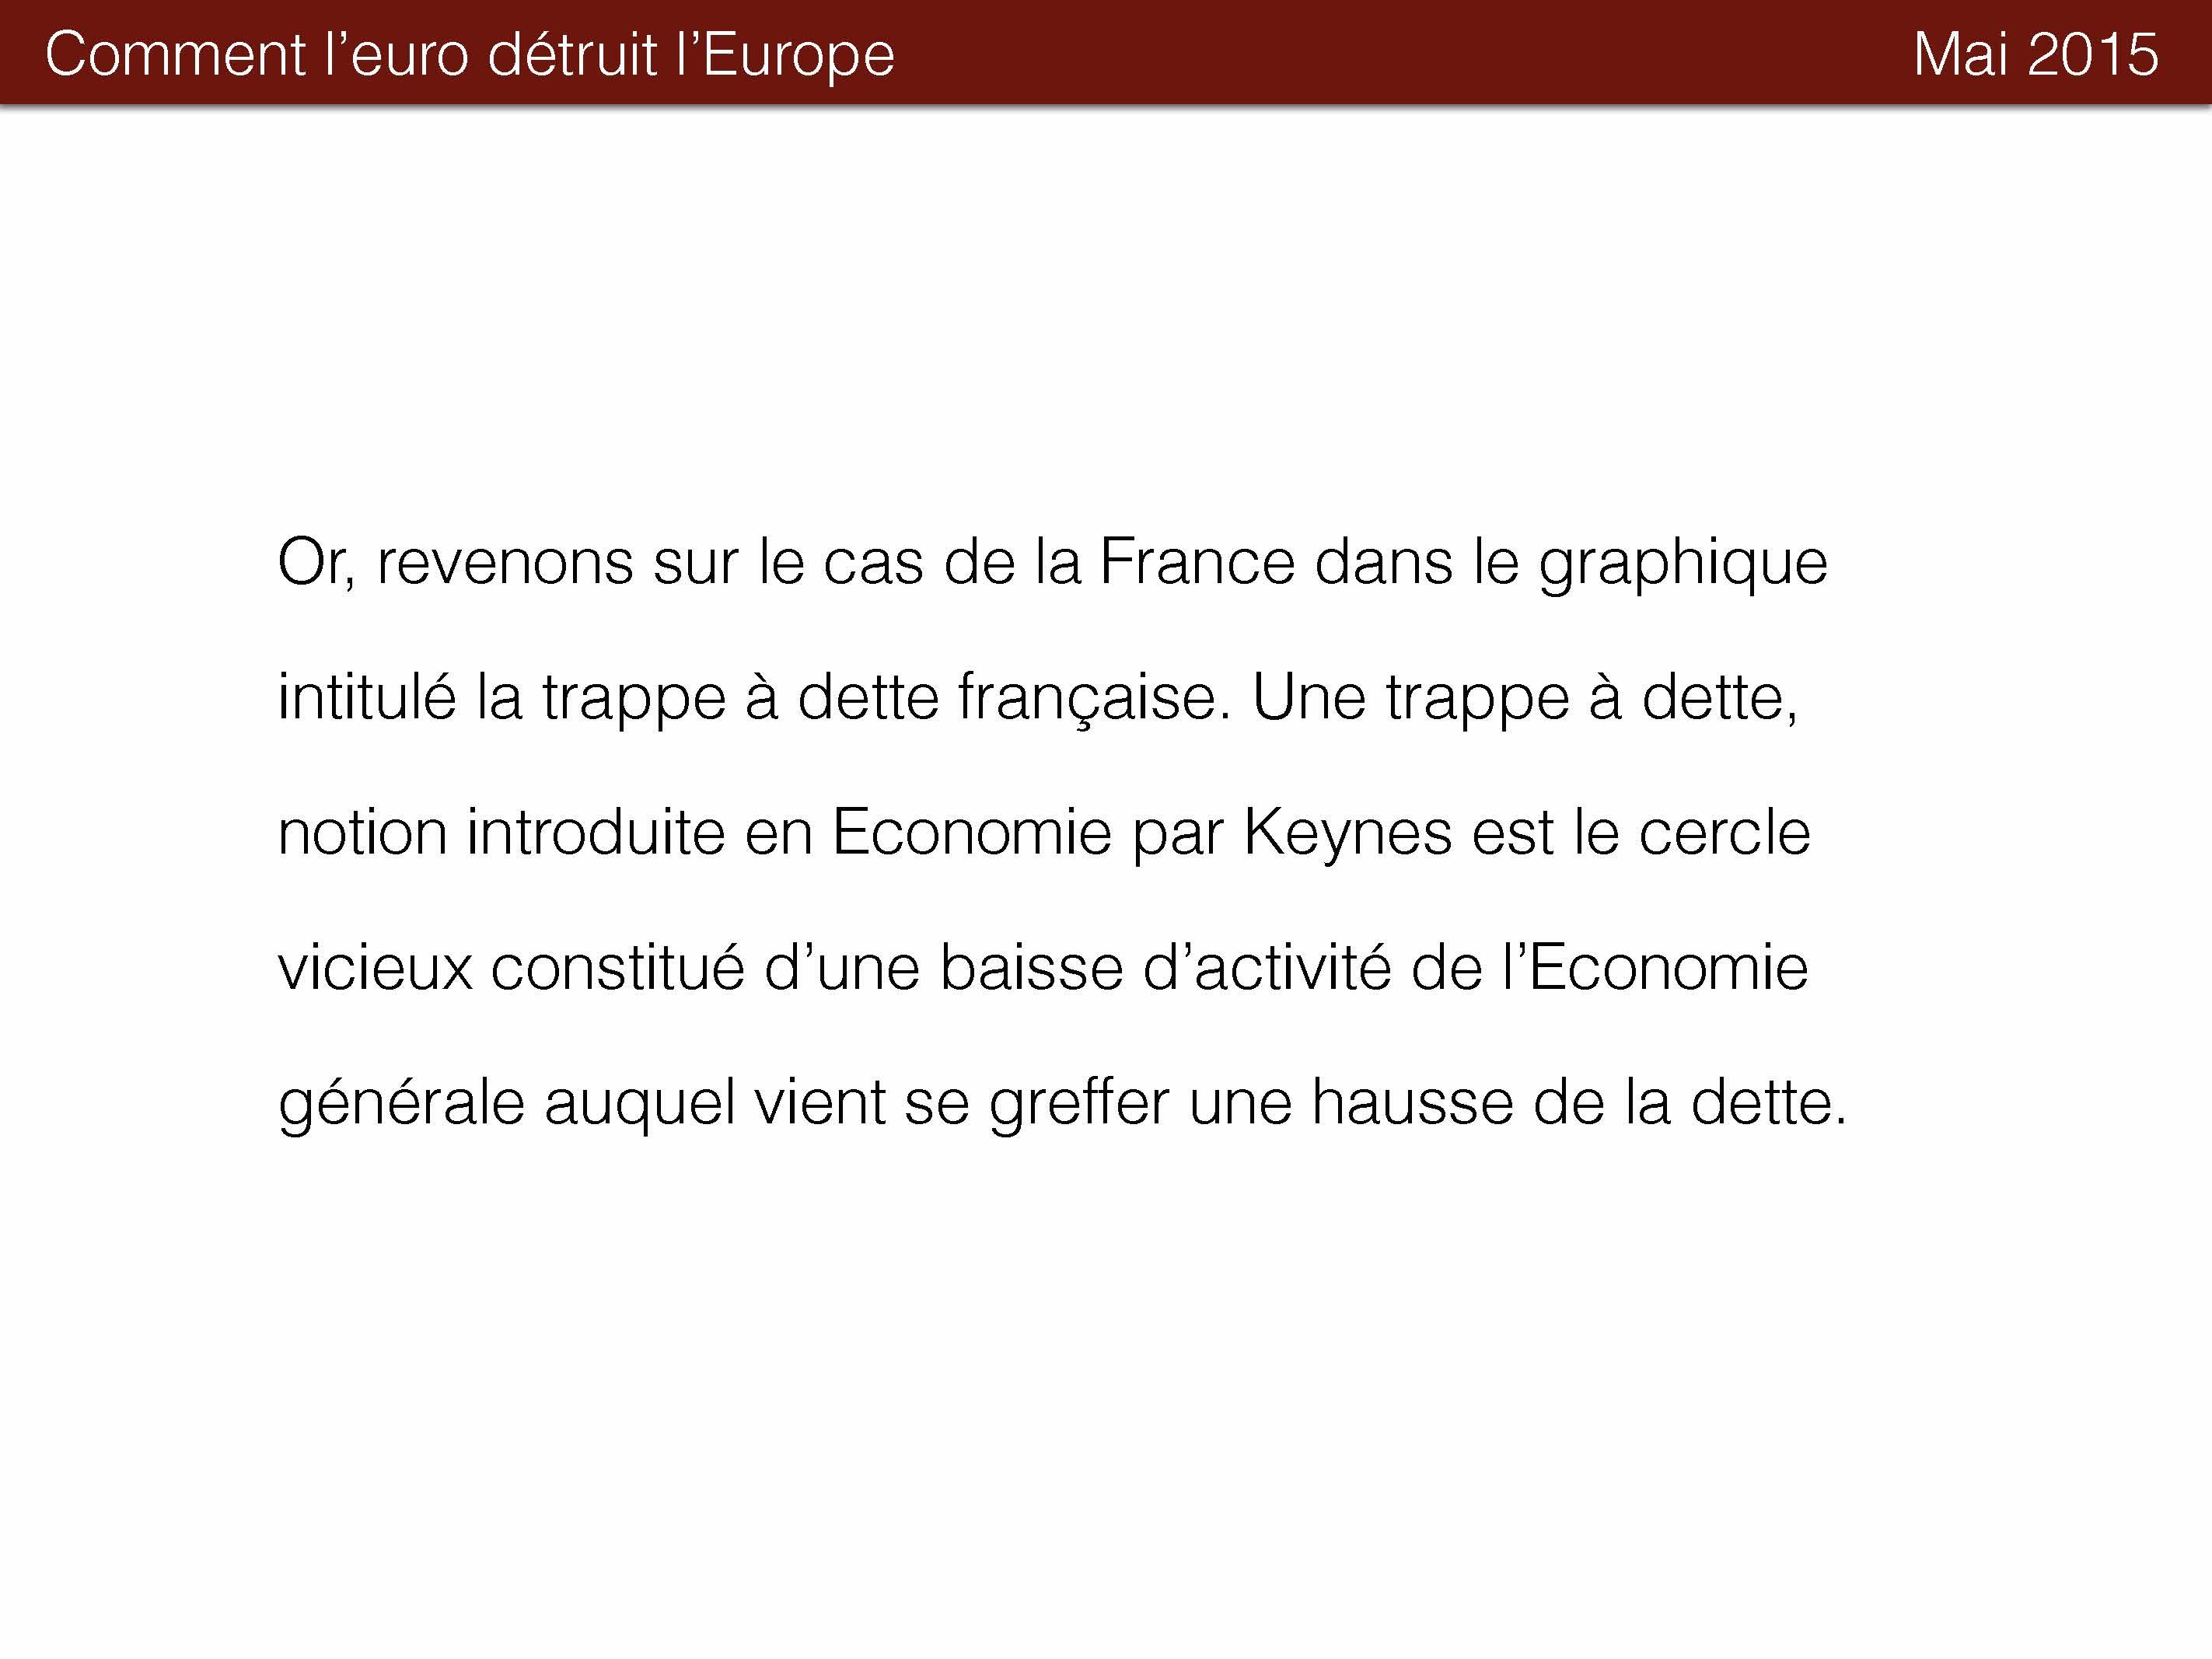 EUro_Page_15